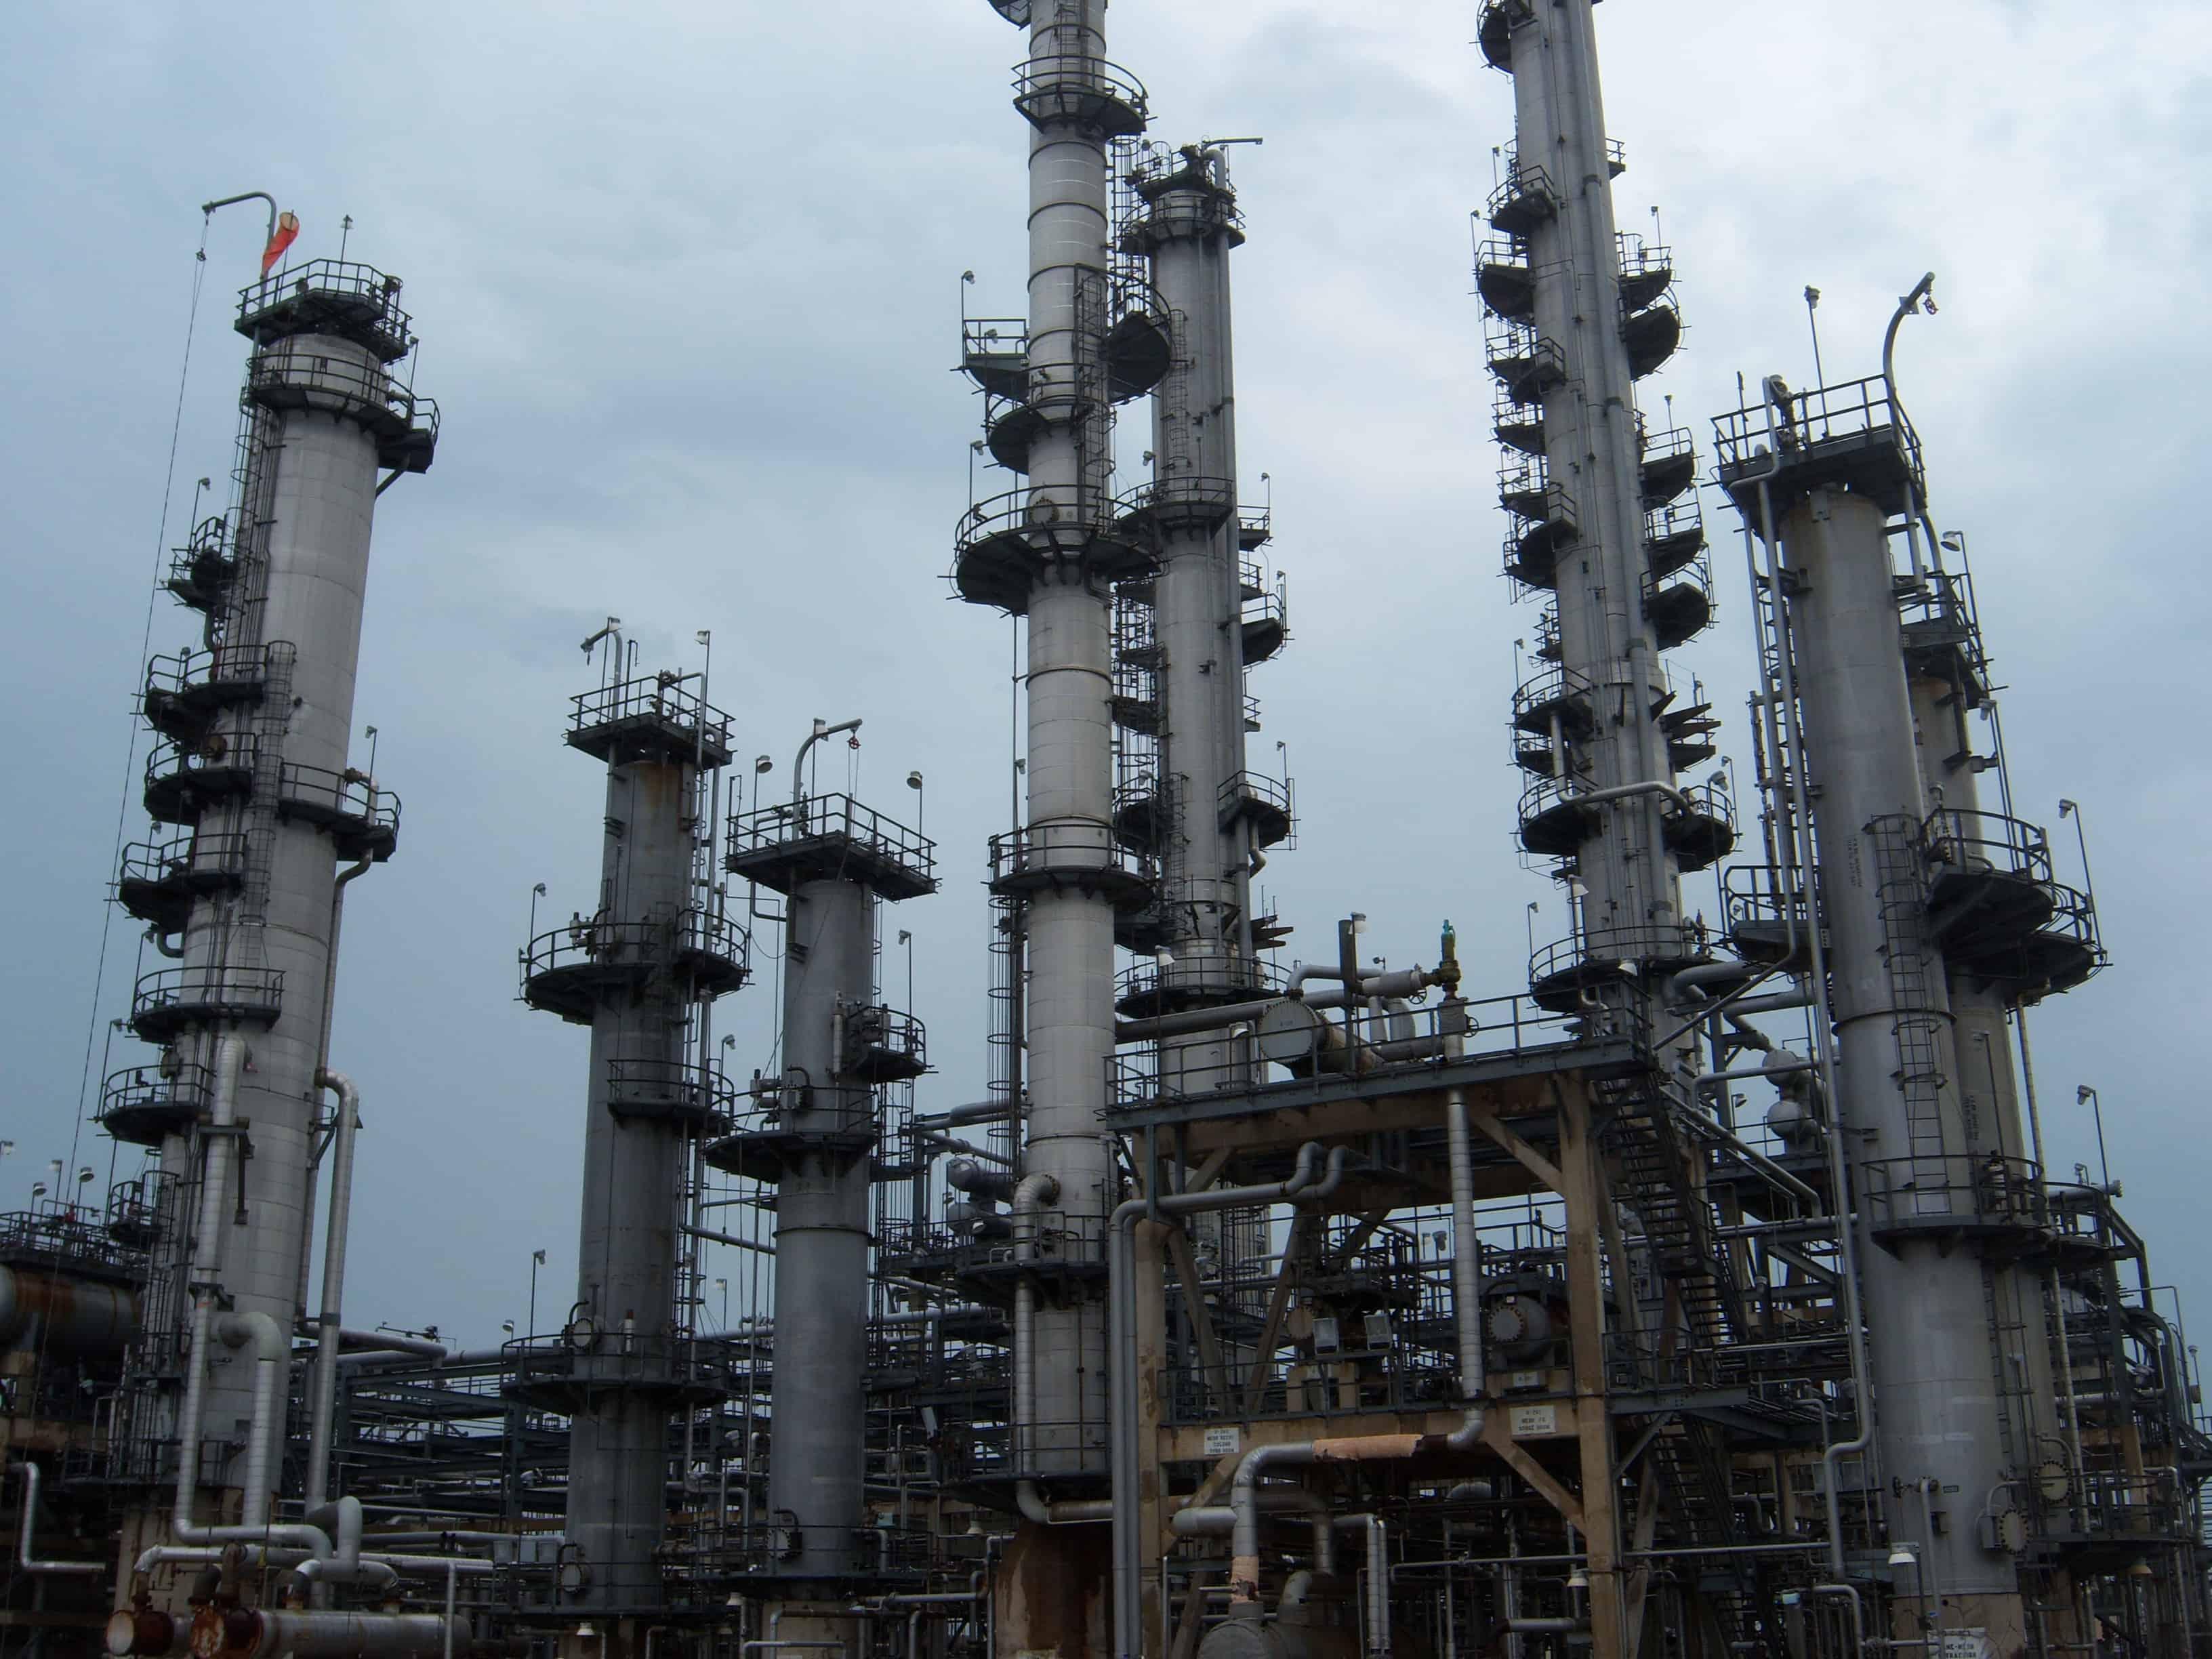 2,400 BPD Methyl Tertiary Butyl Ether (MTBE) Plant for Sale at Phoenix  Equipment